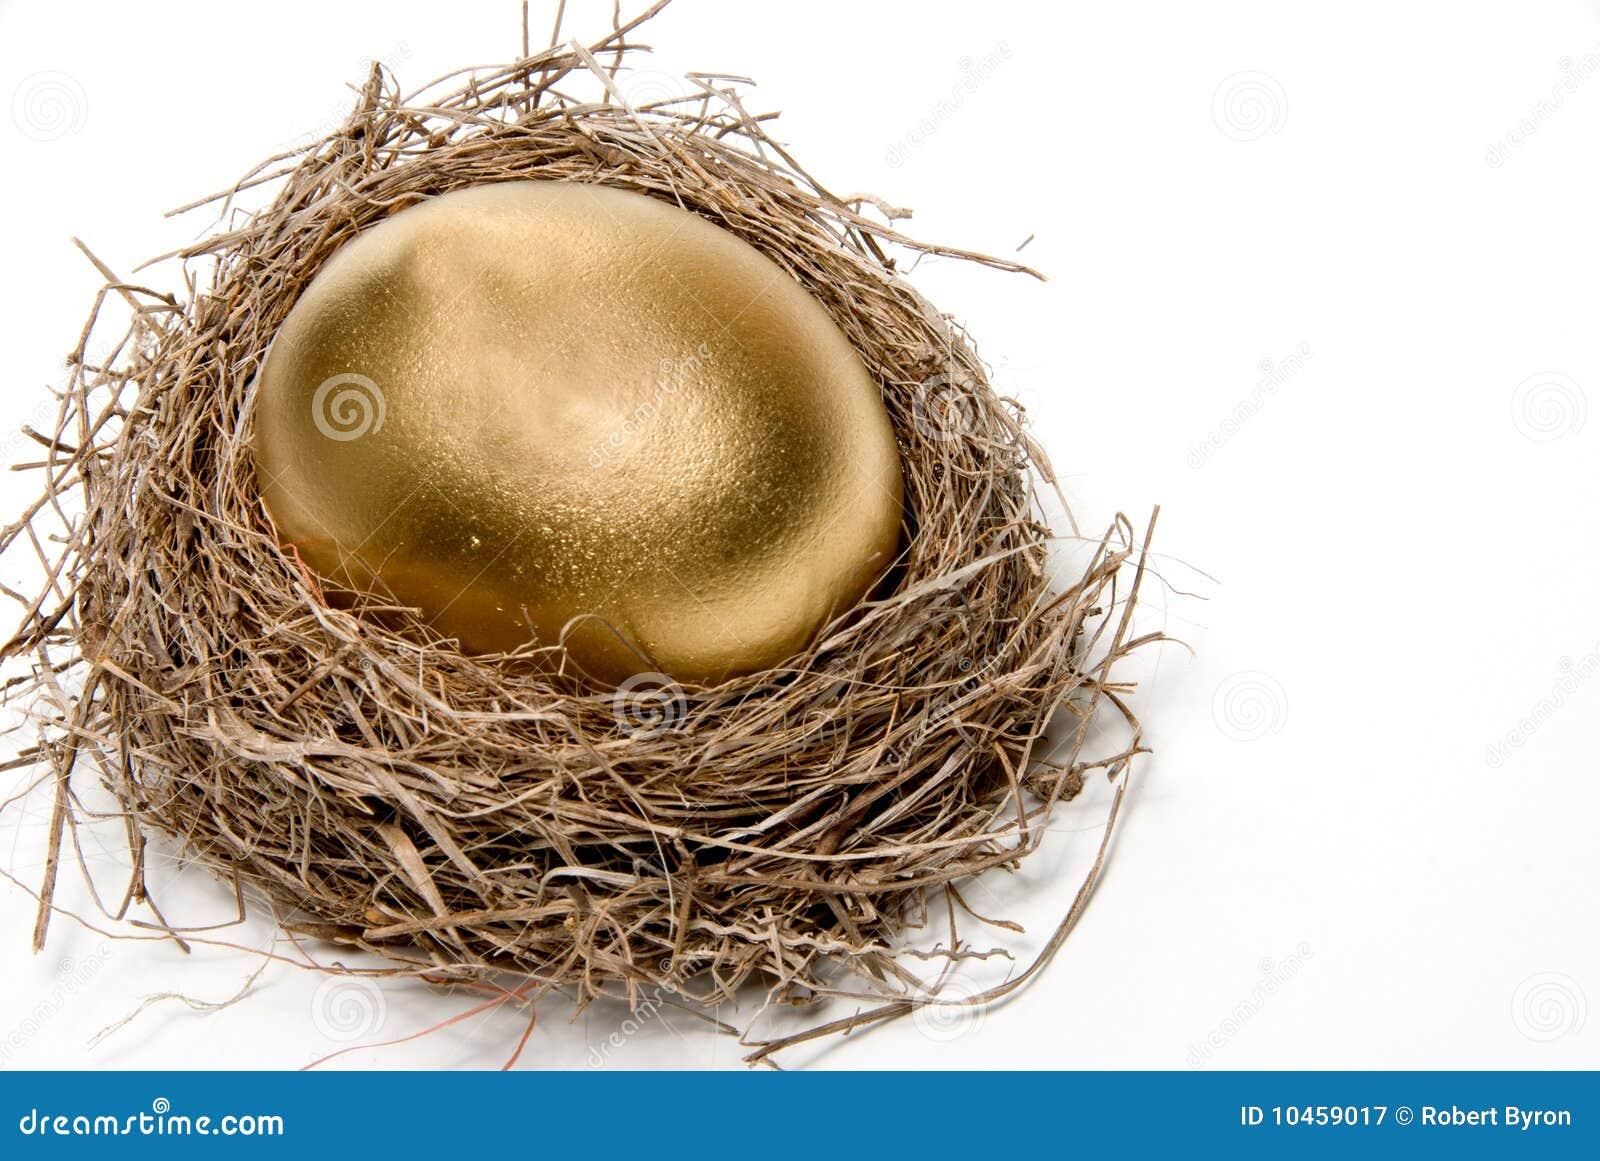 Golden Ei